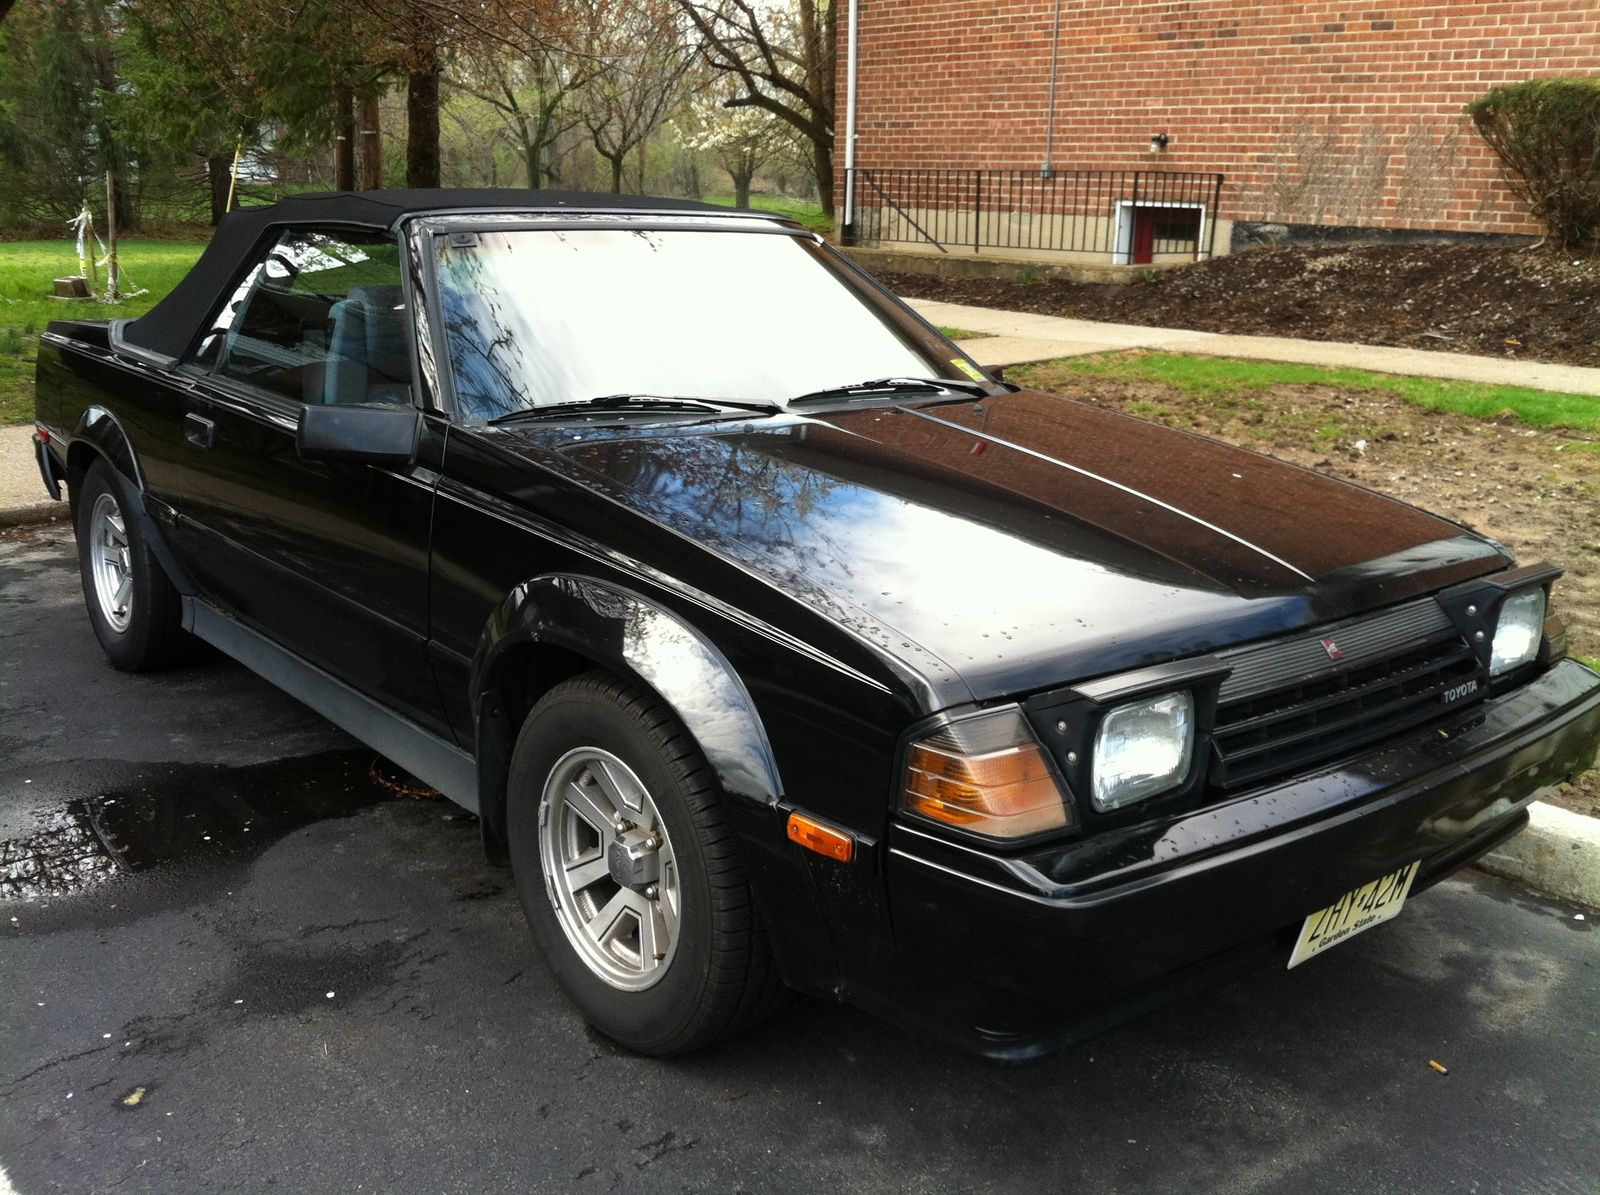 1985 Toyota Celica GTS convertible  toyota  Pinterest